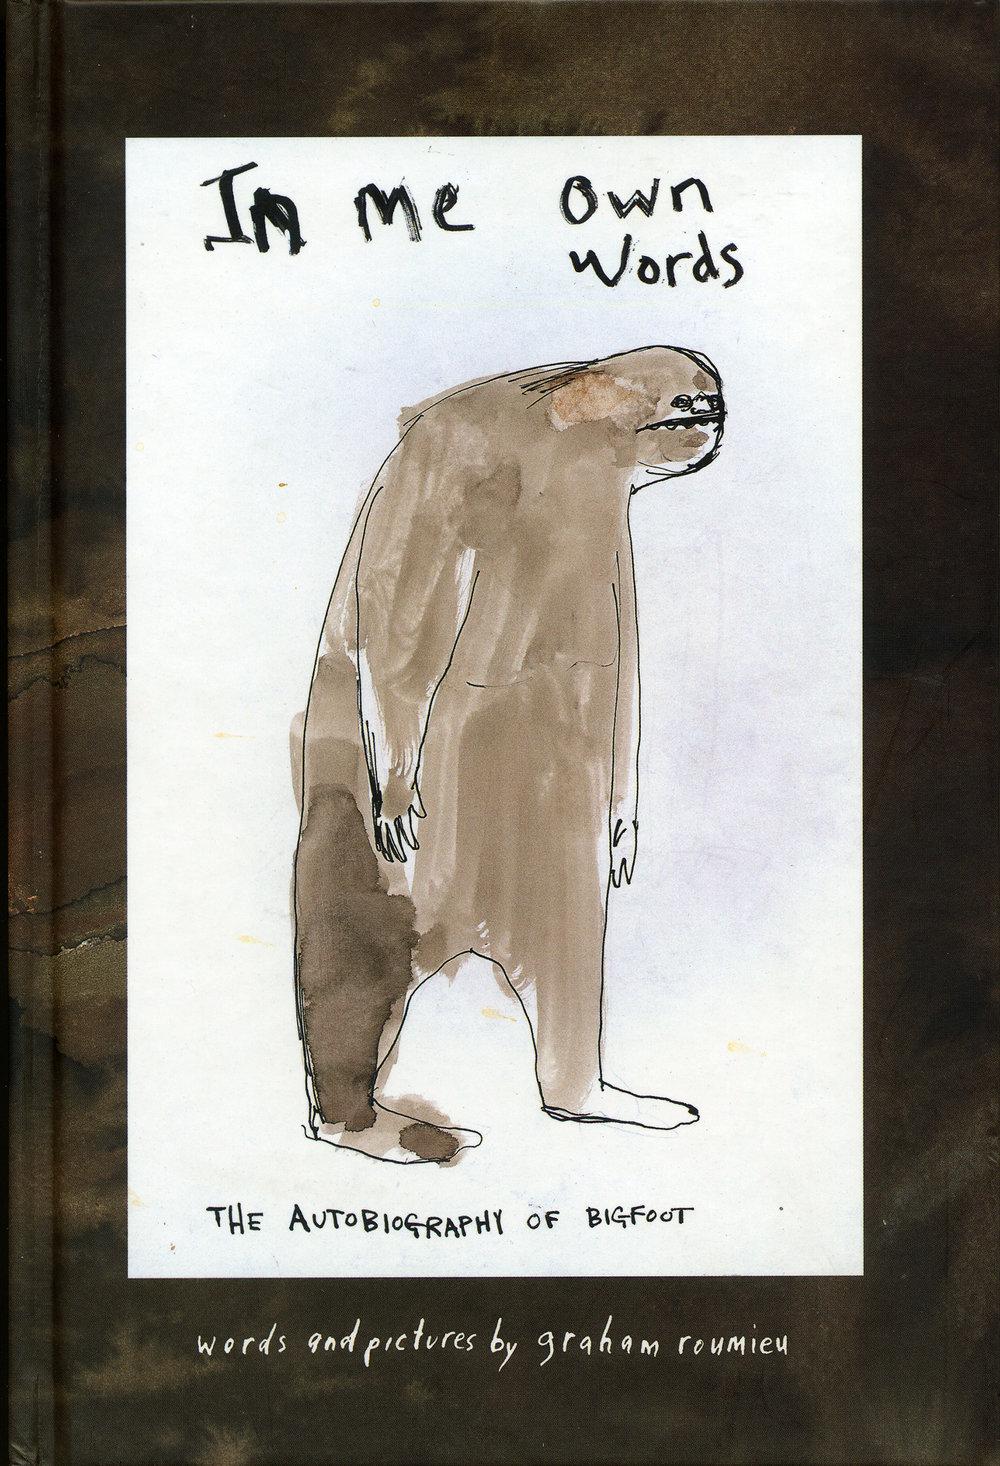 AI 20 2001 - ARTIST: Graham RoumieuTITLE: In me Own Words [3 of 3]CLIENT: Manic D Press